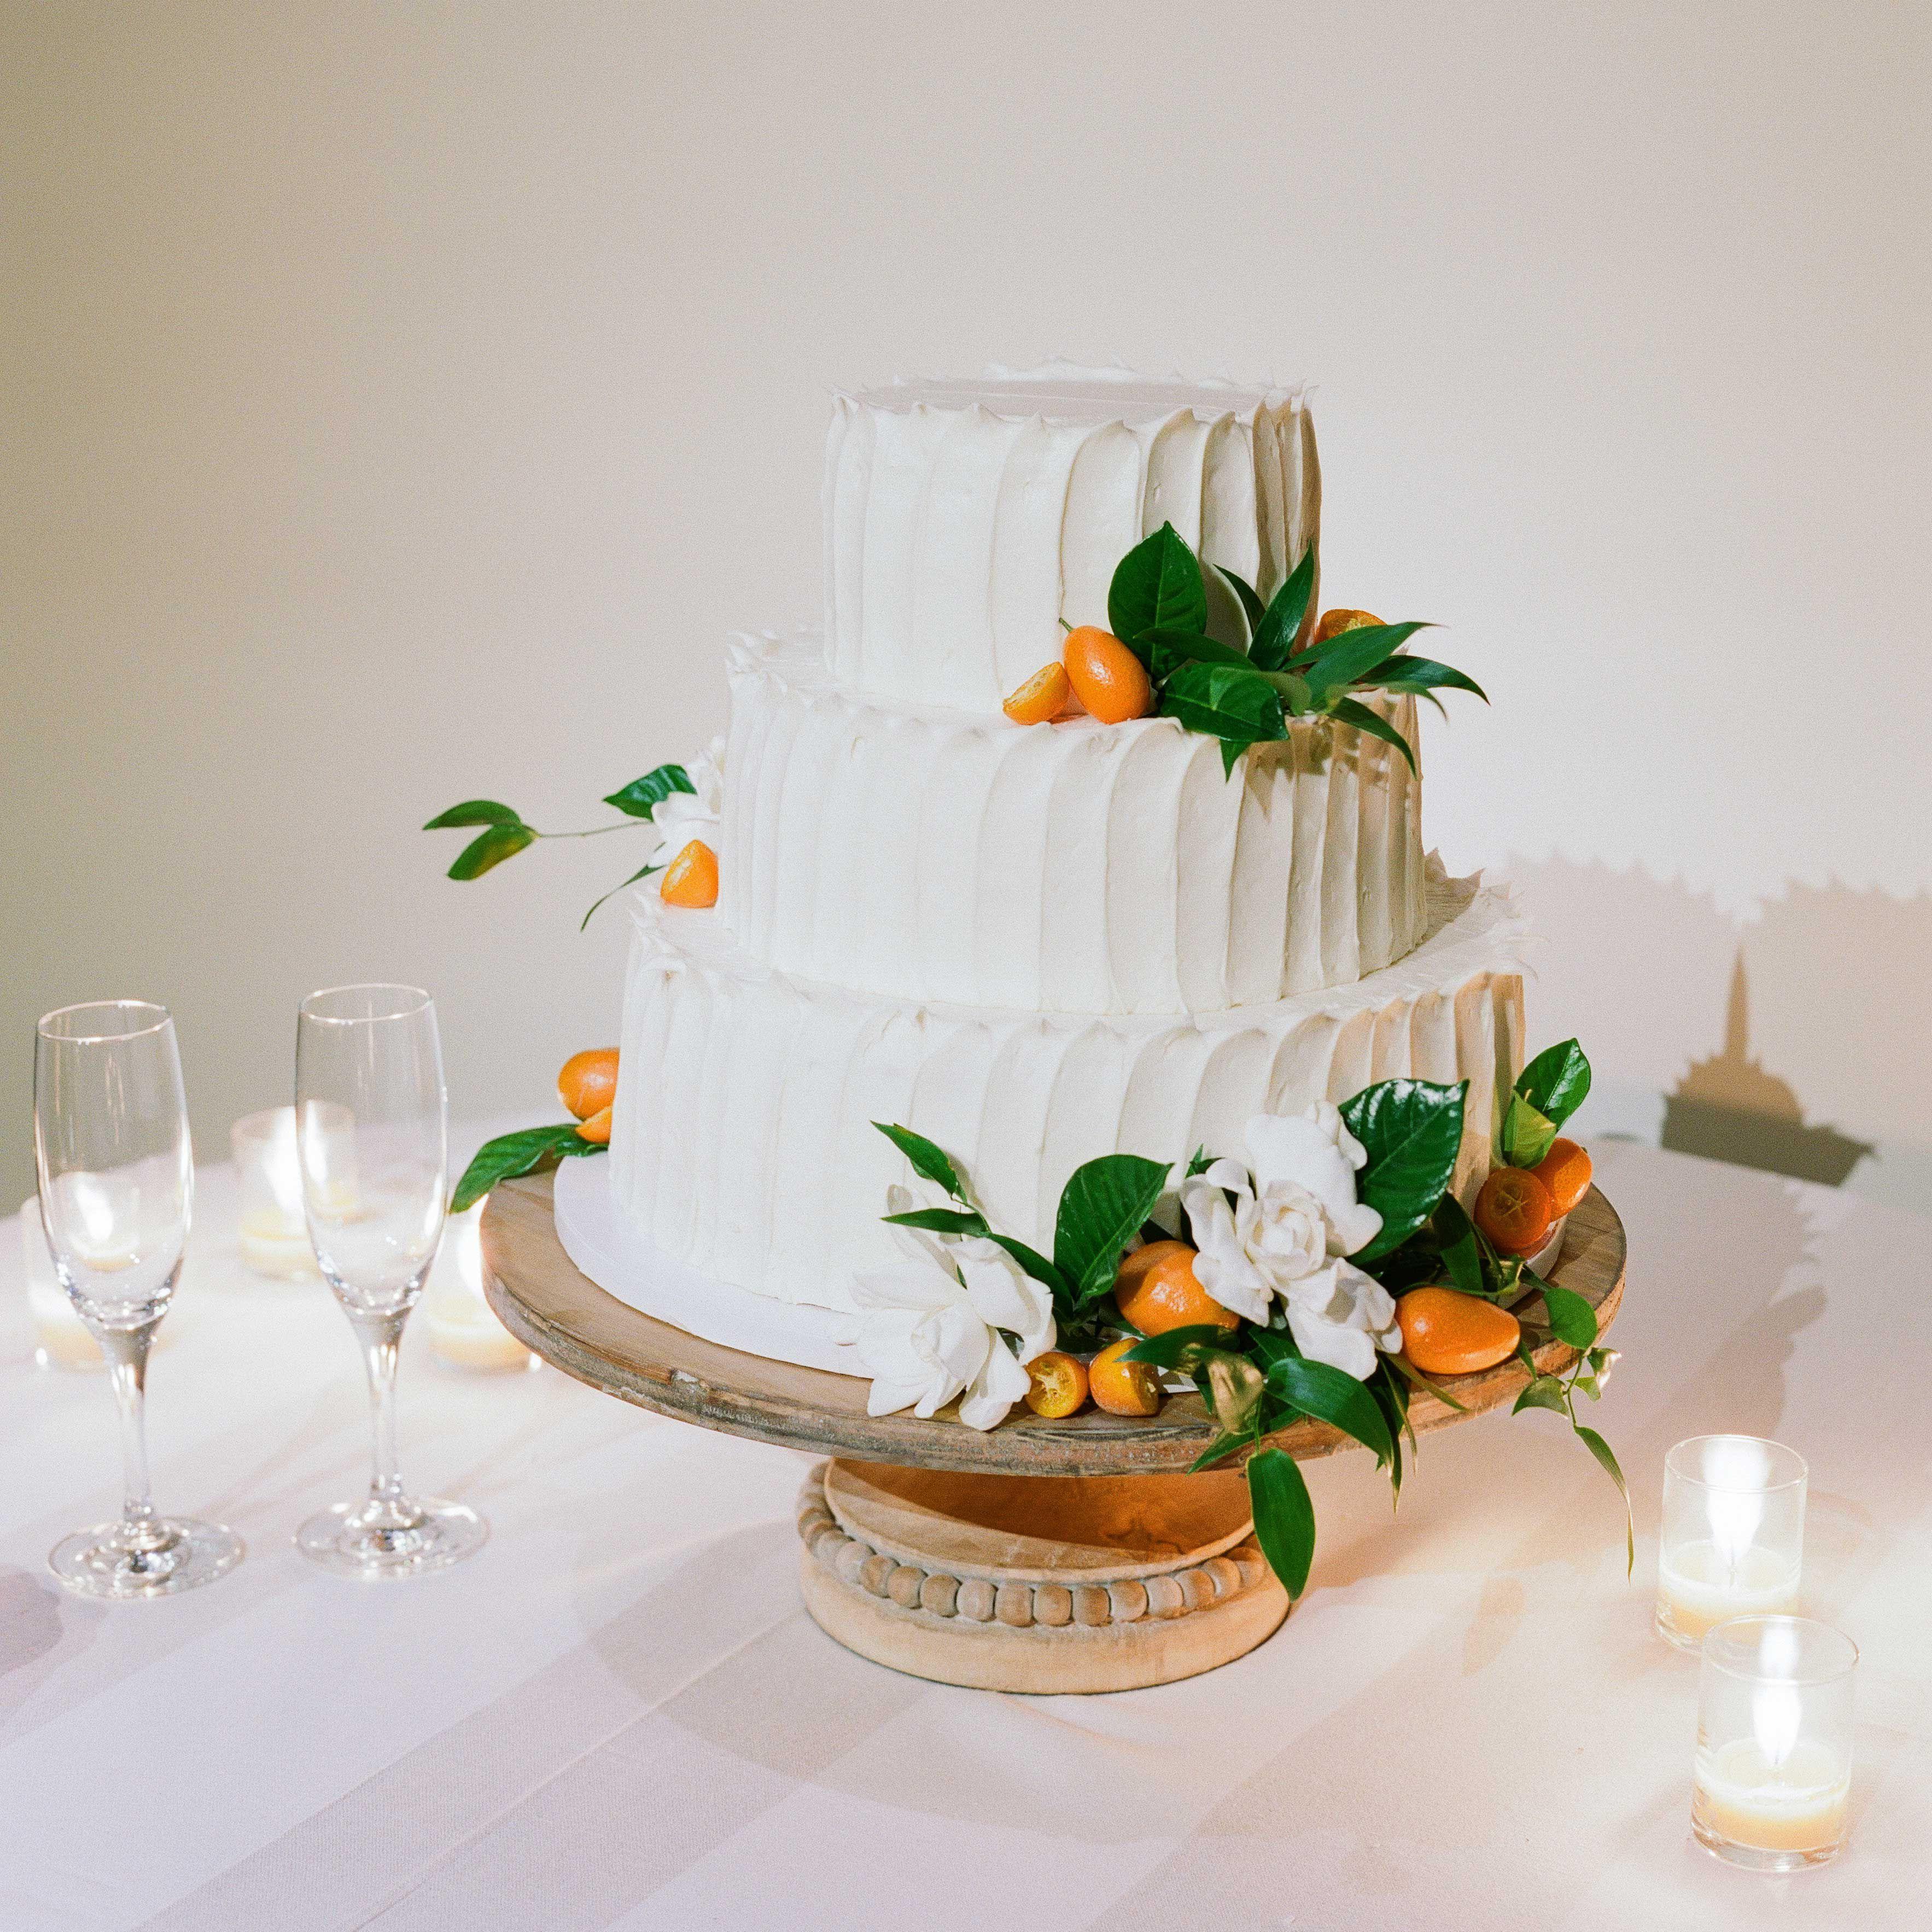 32 Buttercream Wedding Cakes